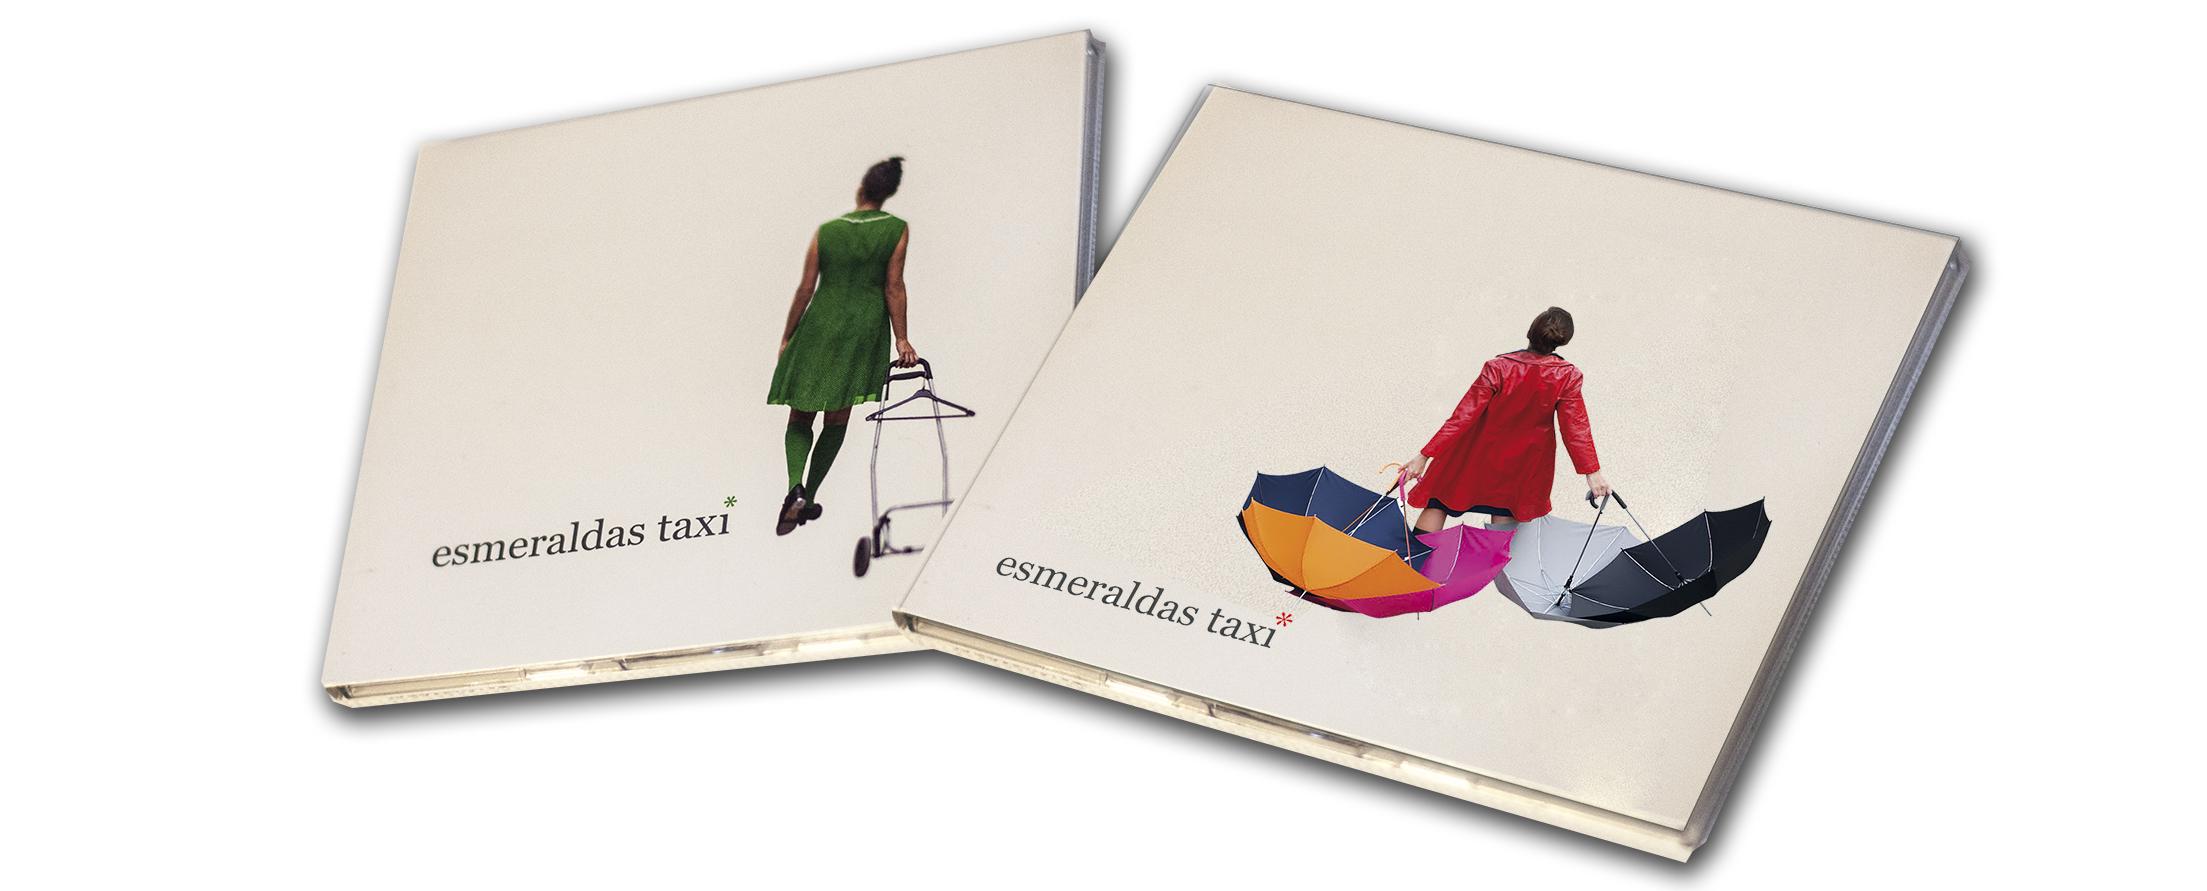 esmeraldas cds